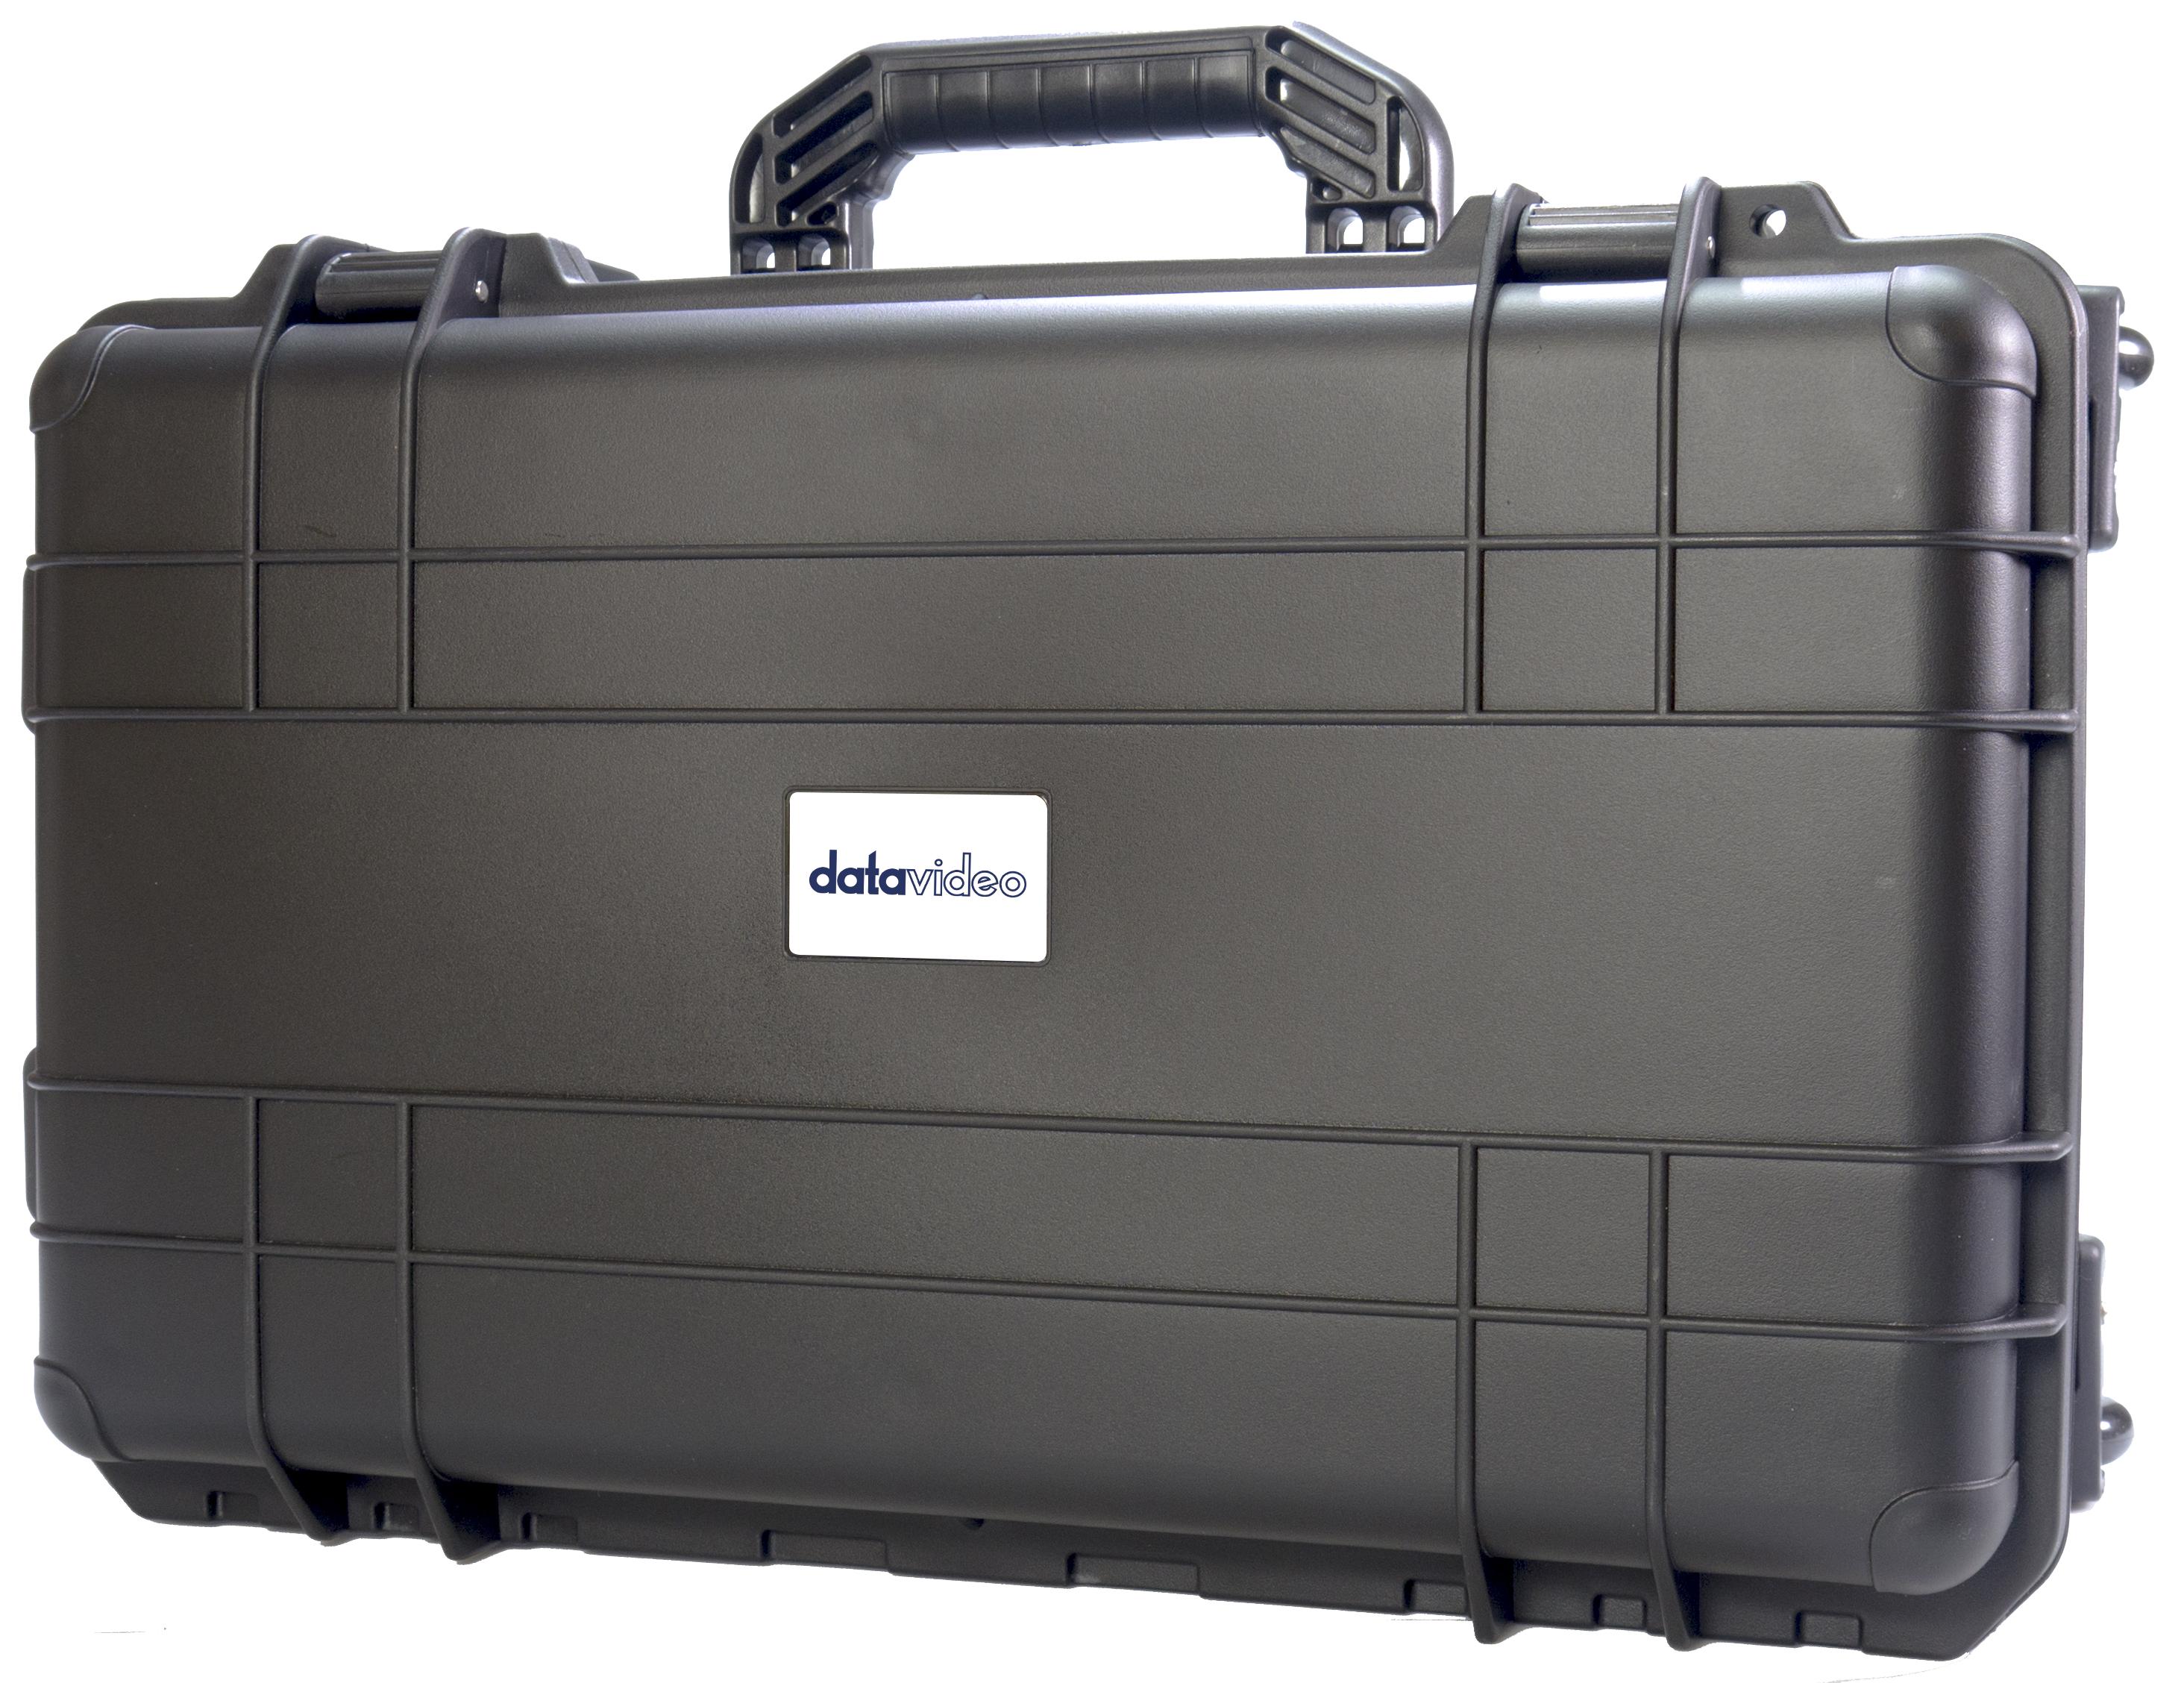 Datavideo HC-700